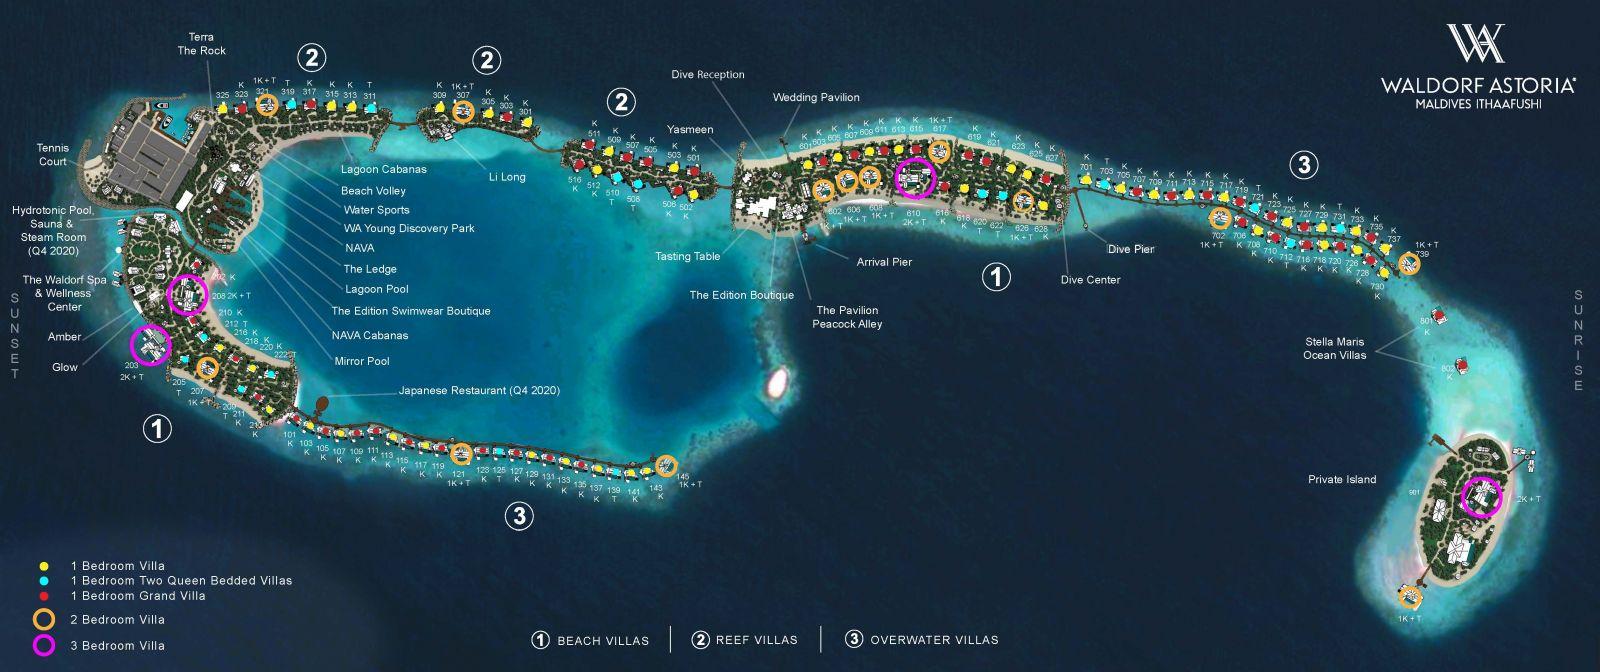 Agentstvo Puteshestvuj Waldorf Astoria Maldives Ithaafushi 5 Maldivy Male